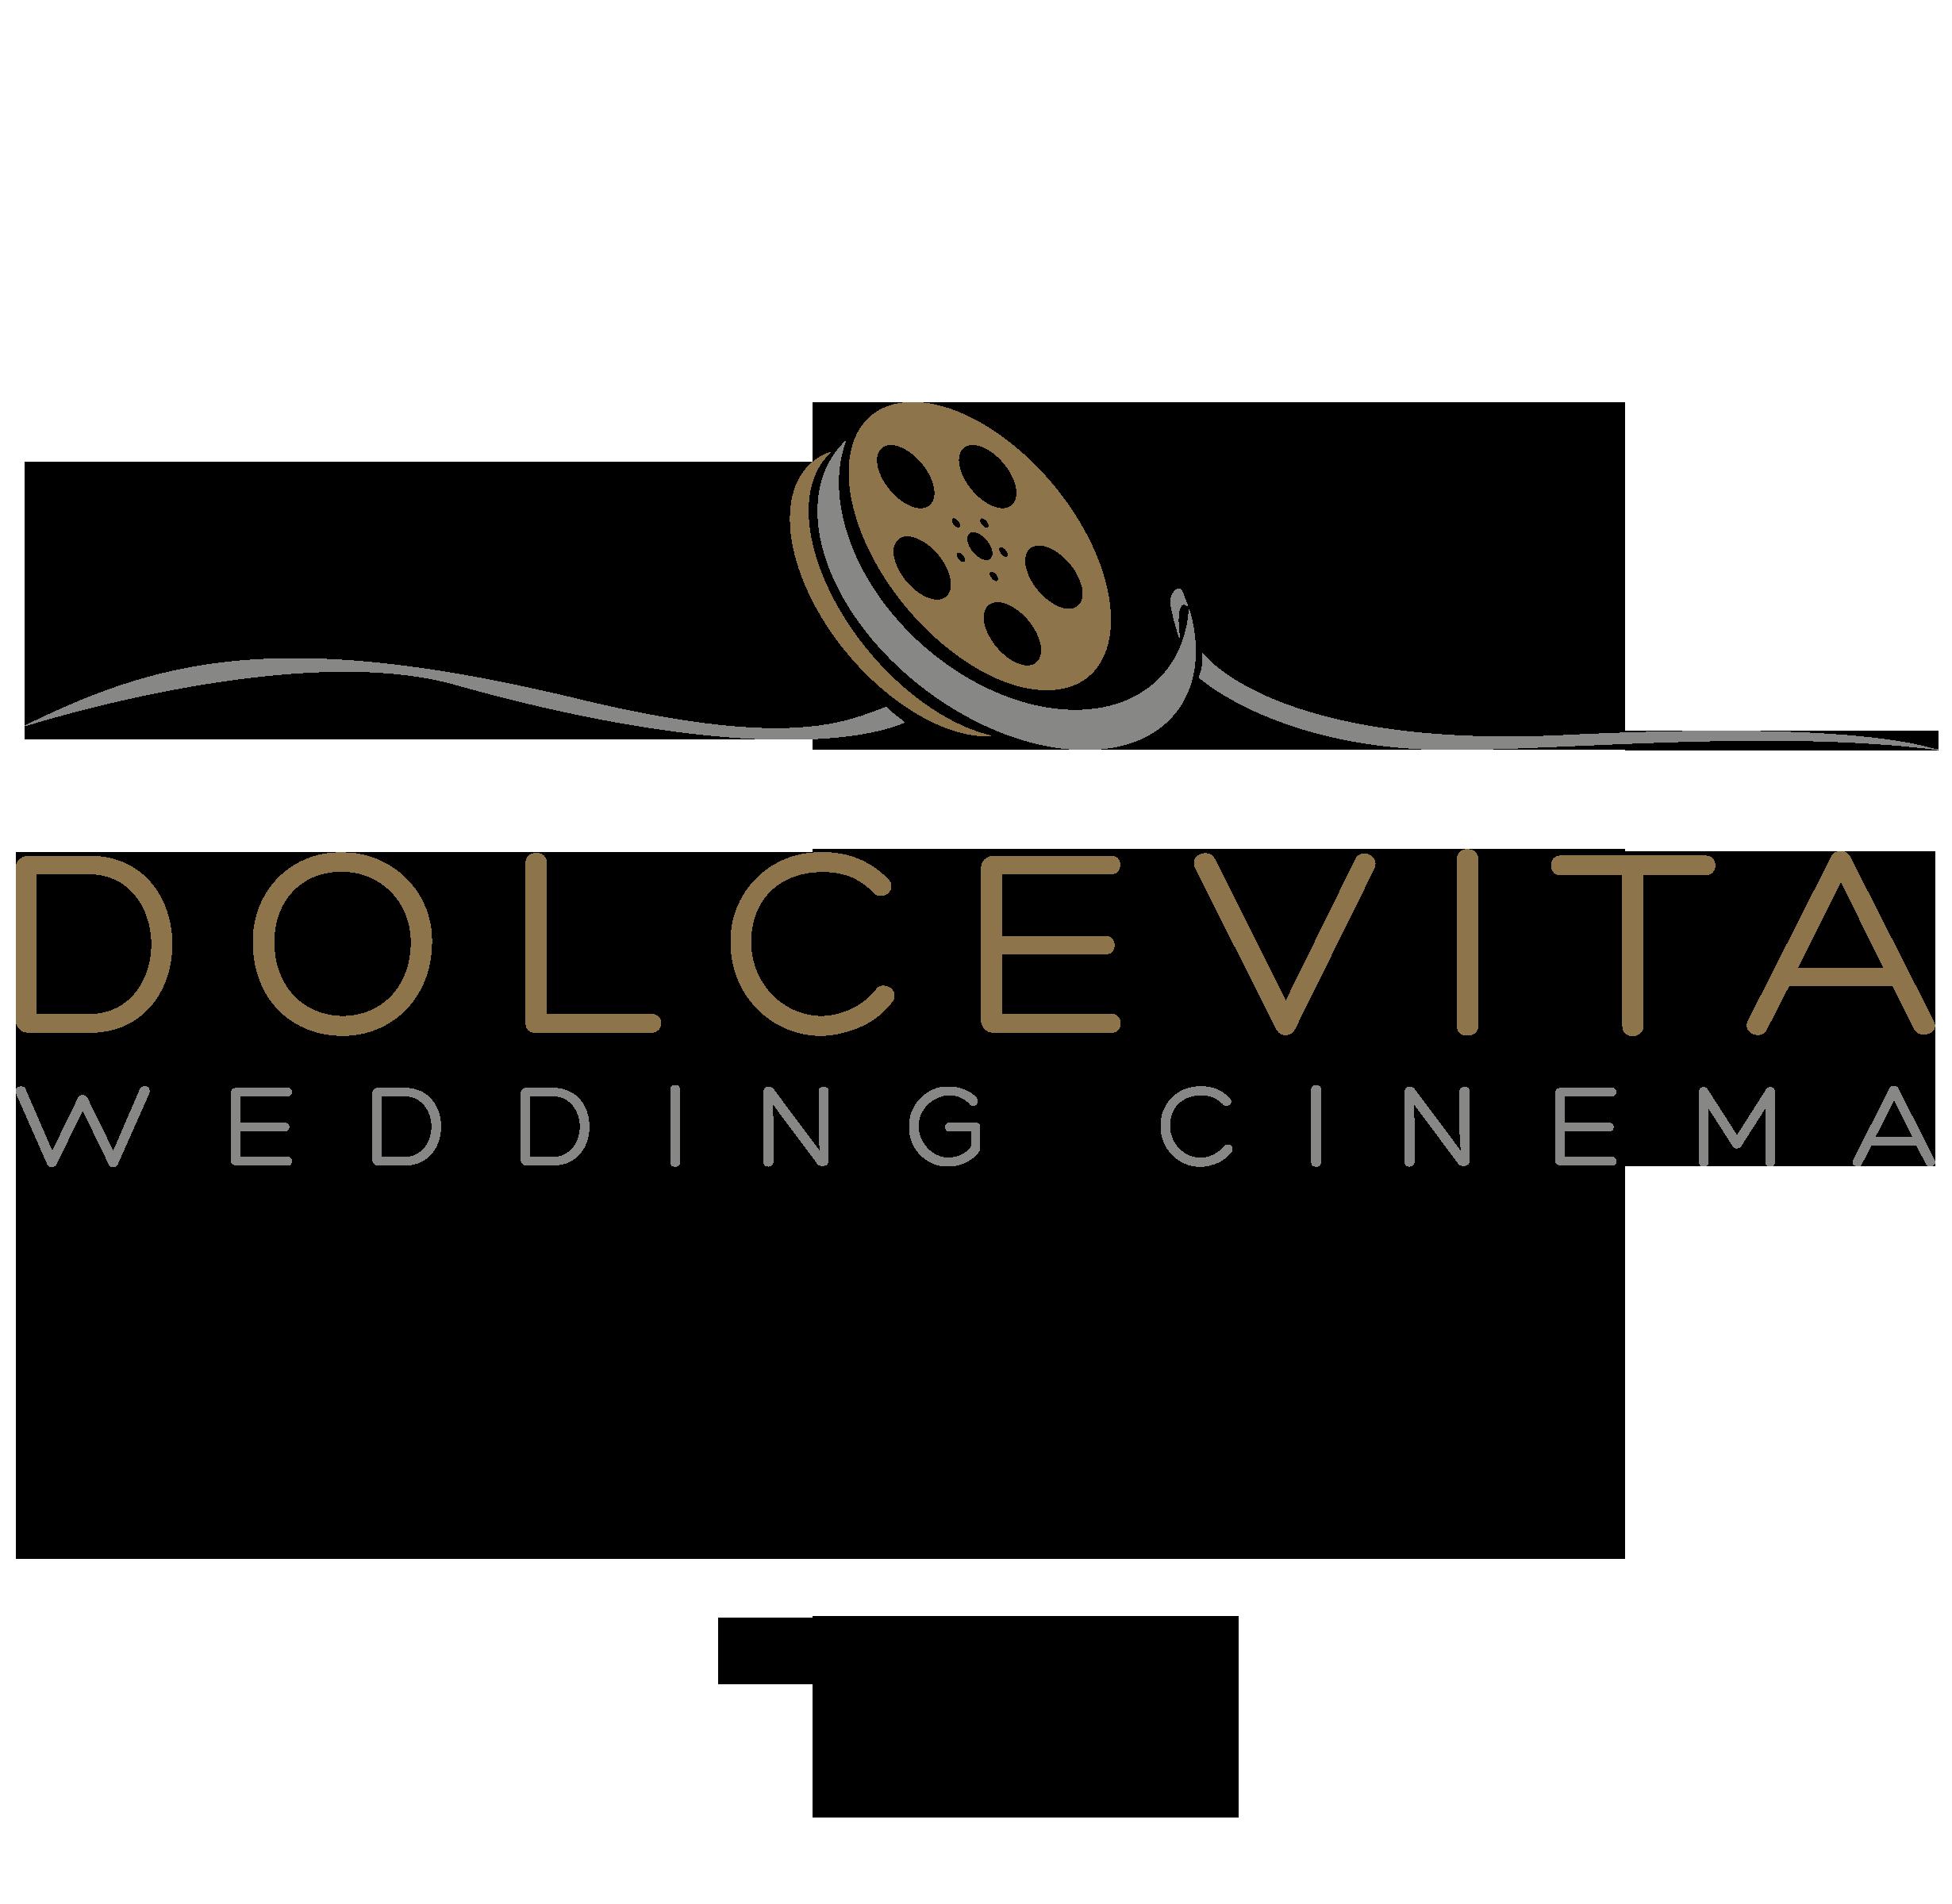 DOLCEVITA Wedding Cinema - Italian Wedding Videographer